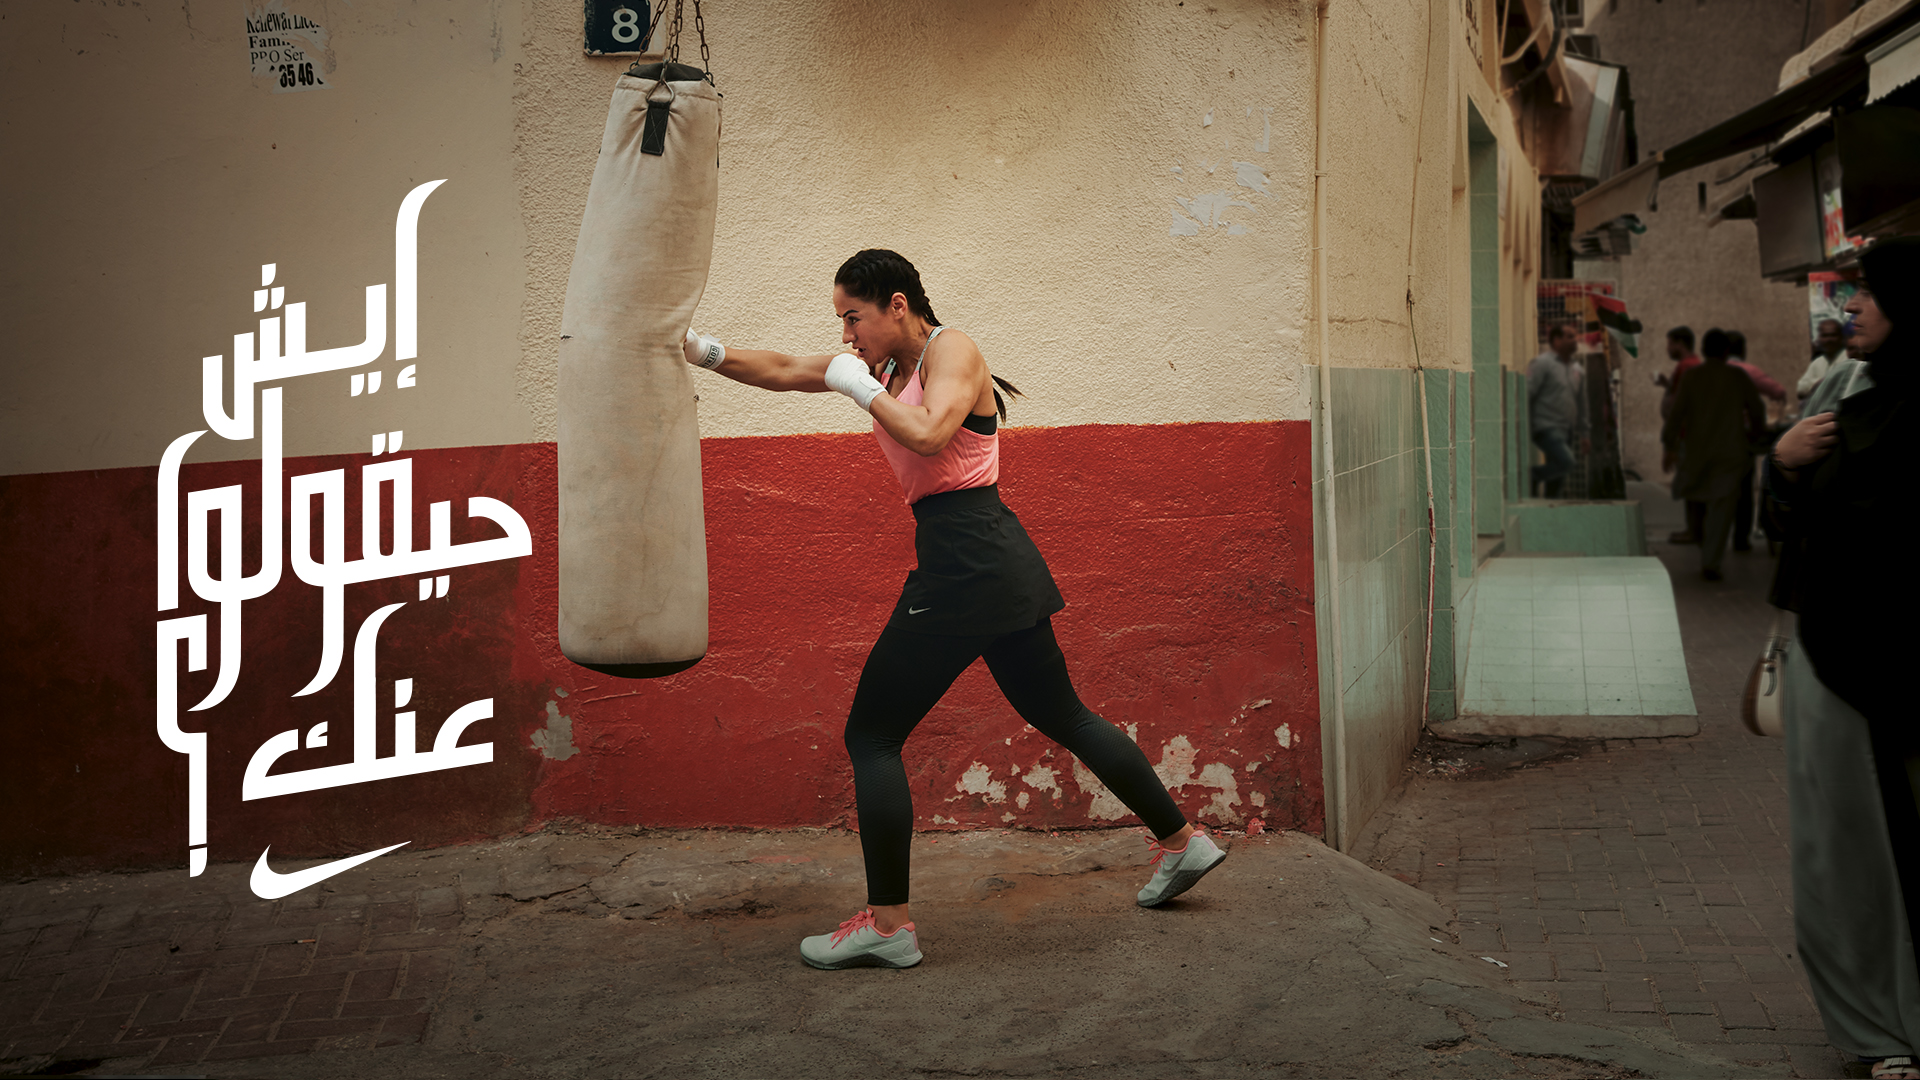 bosquejo Leer Conquista  Nike Women - Middle East — Teresa Montenegro